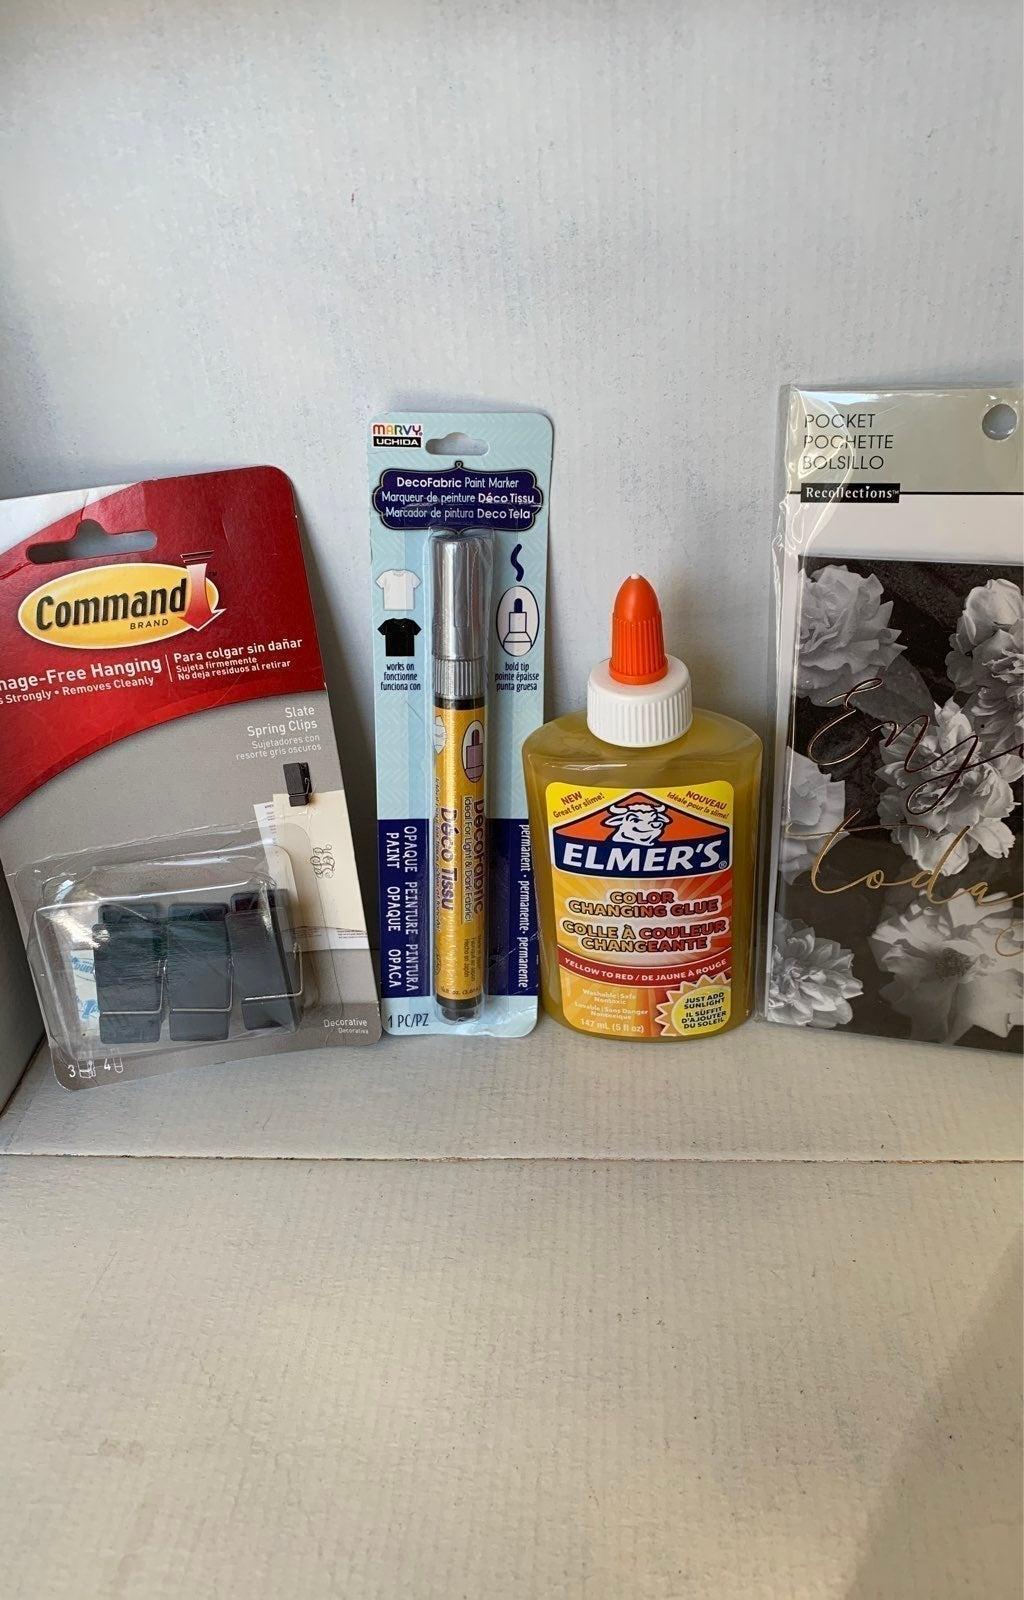 Glue, paint marker, damage free hanging,